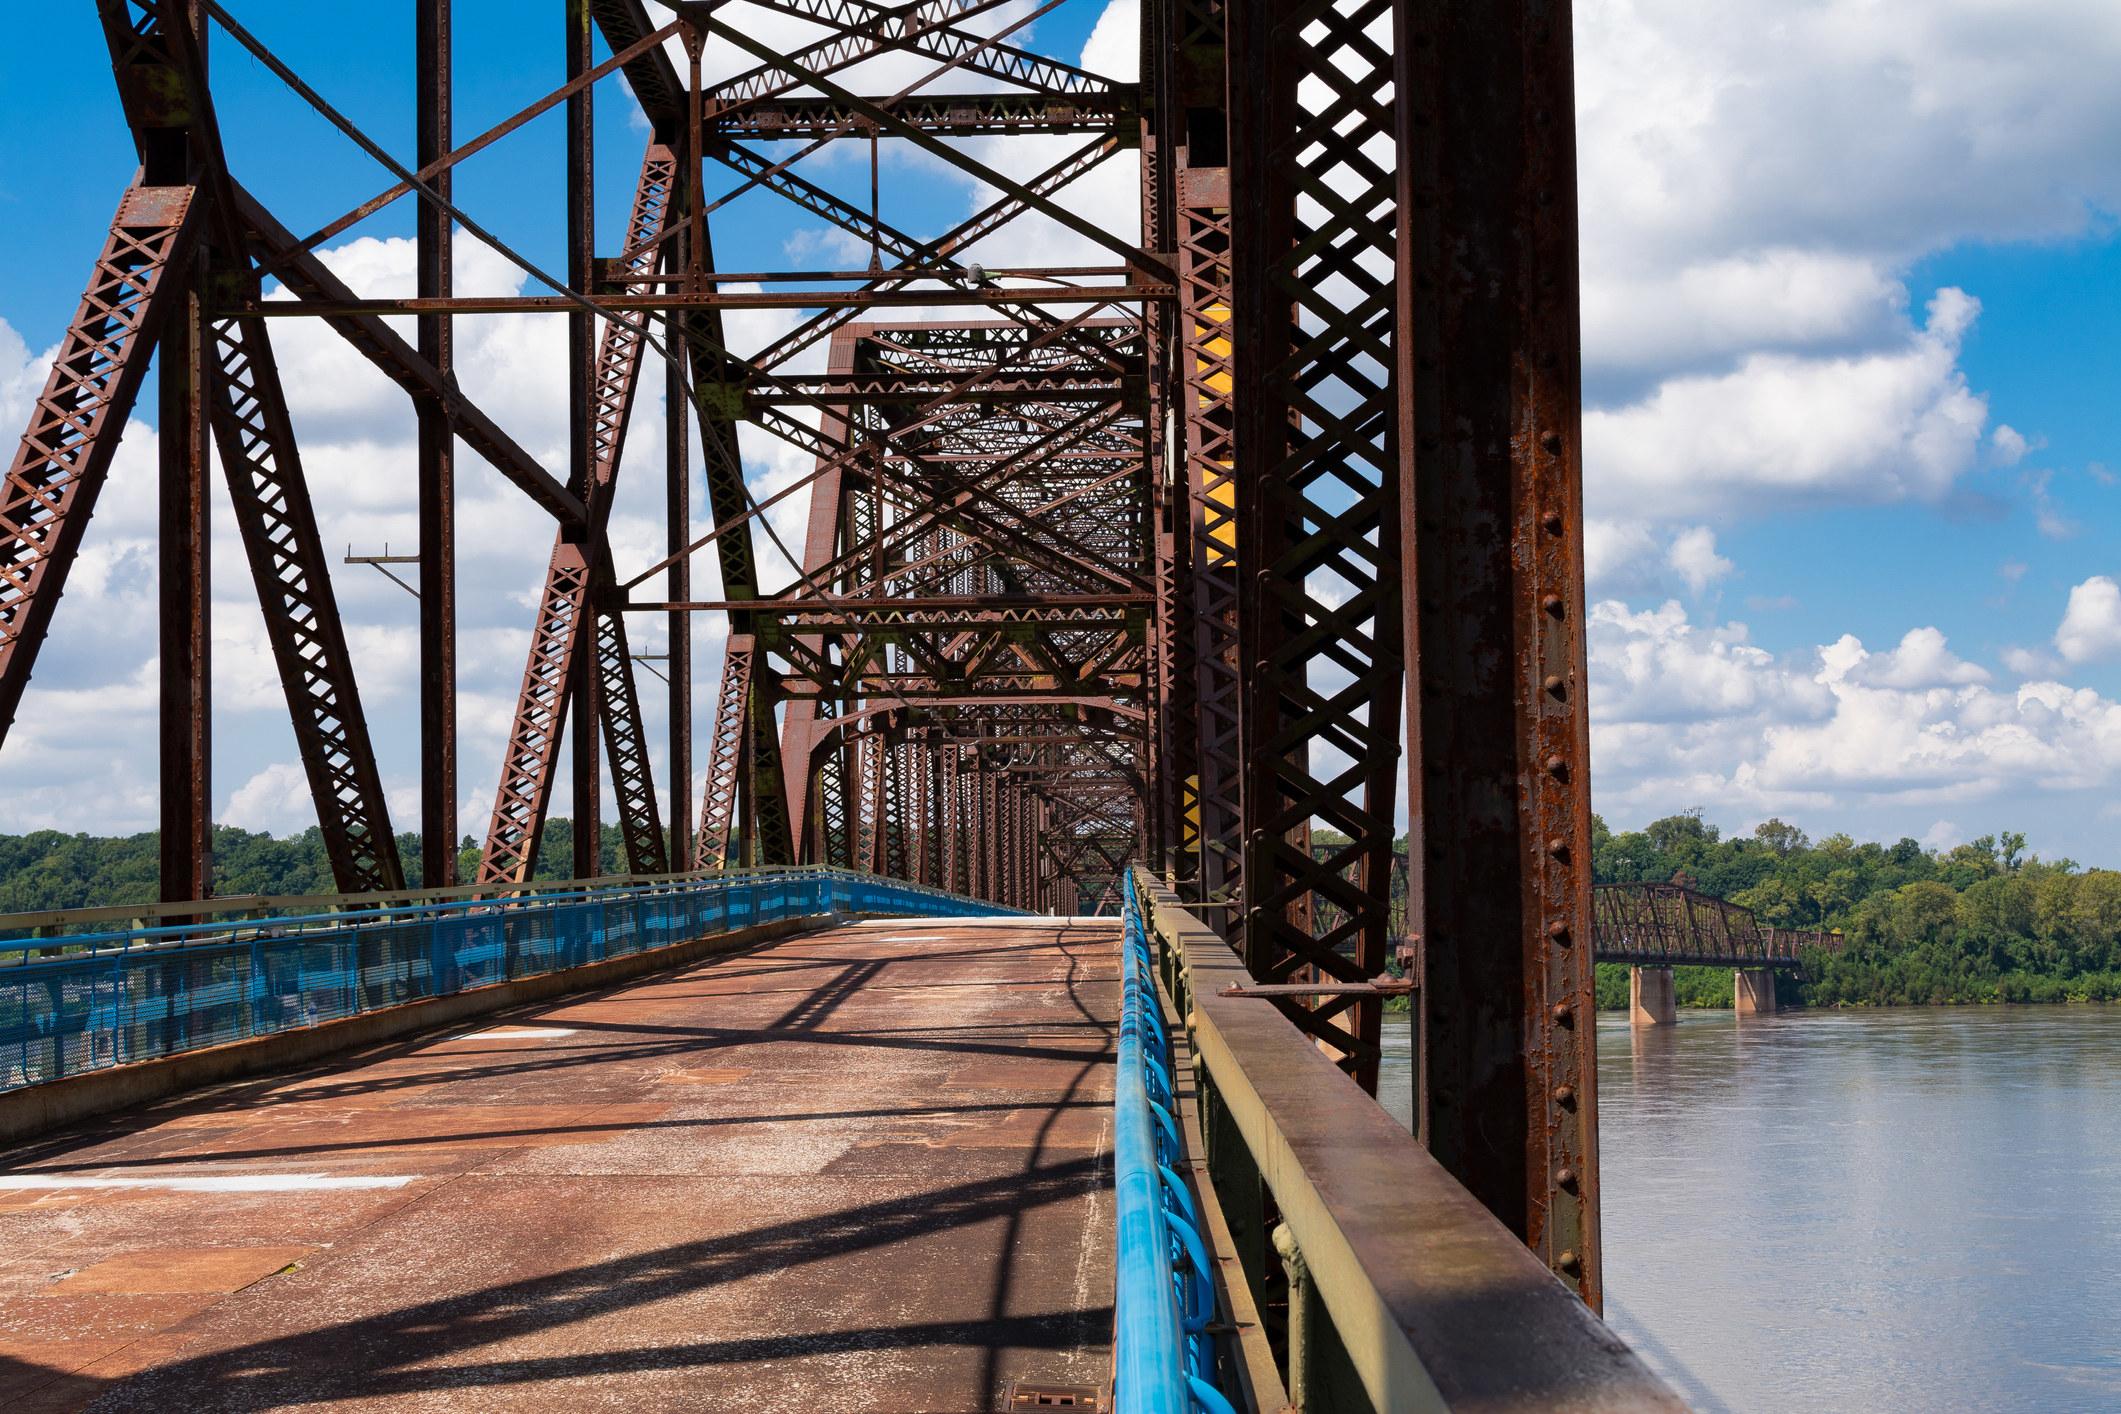 The Chain of Rocks Bridge on old Route 66 in Illinois/ Missouri